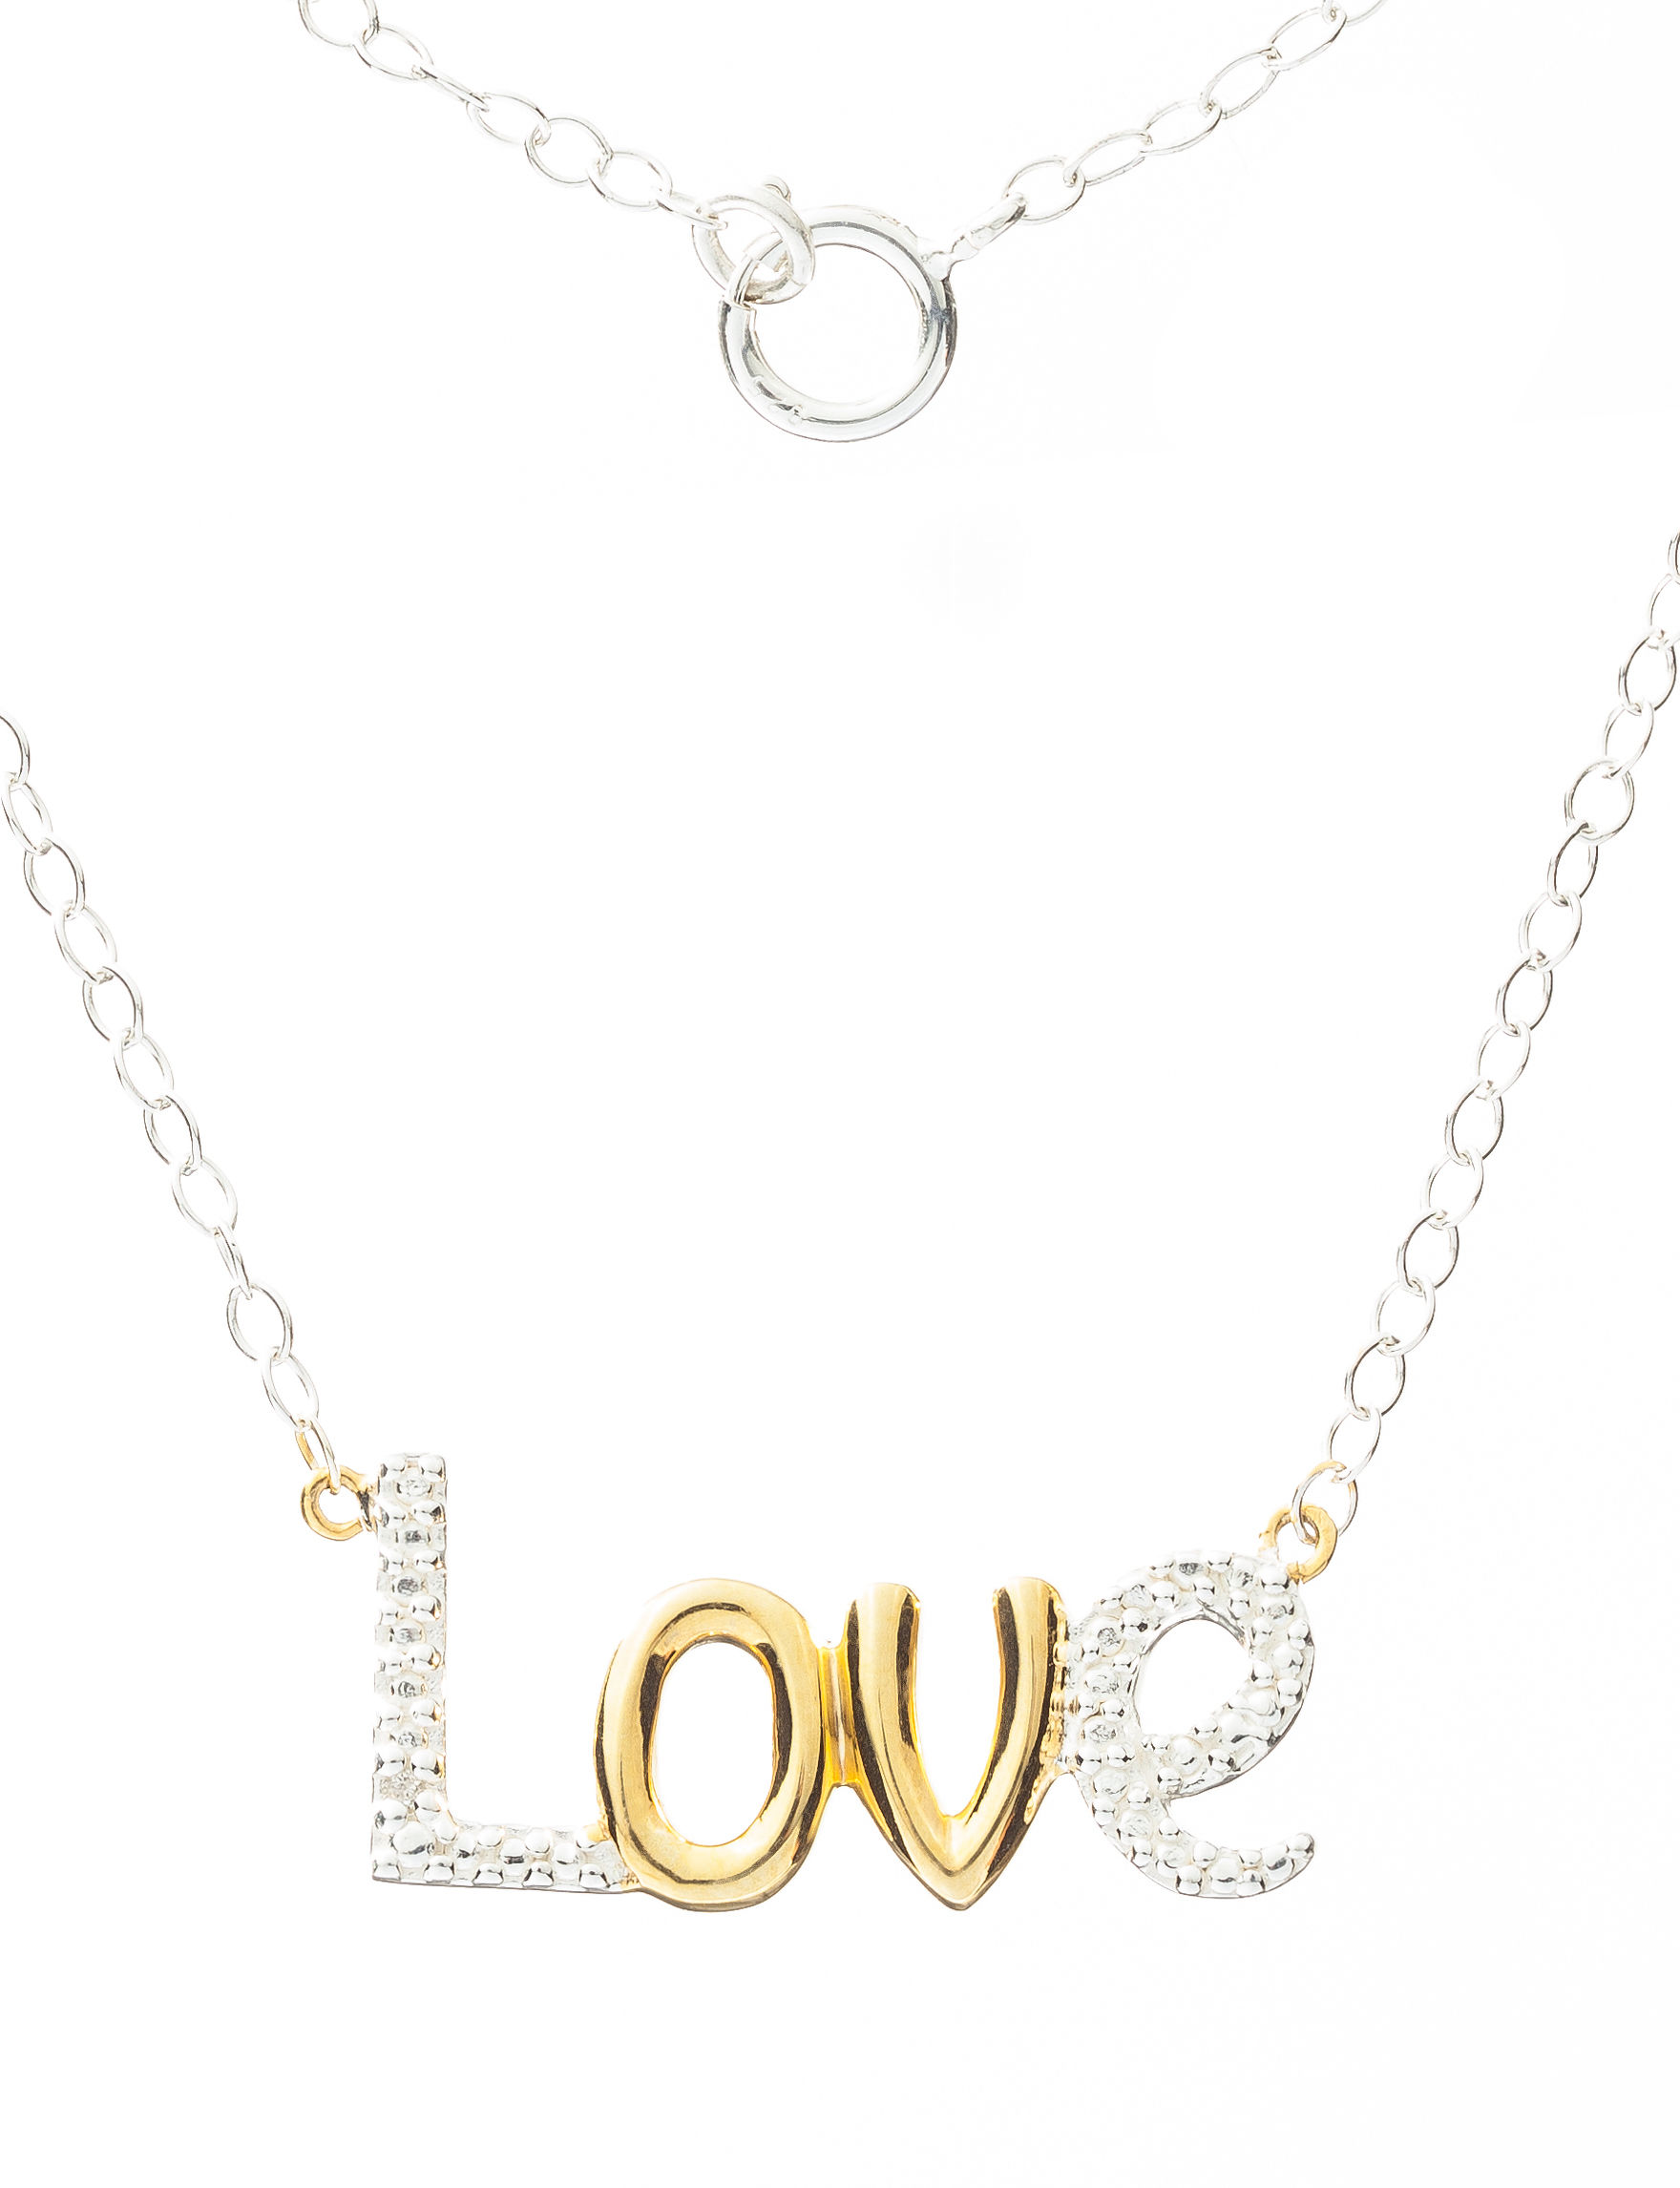 Max Color Silver Necklaces & Pendants Fine Jewelry